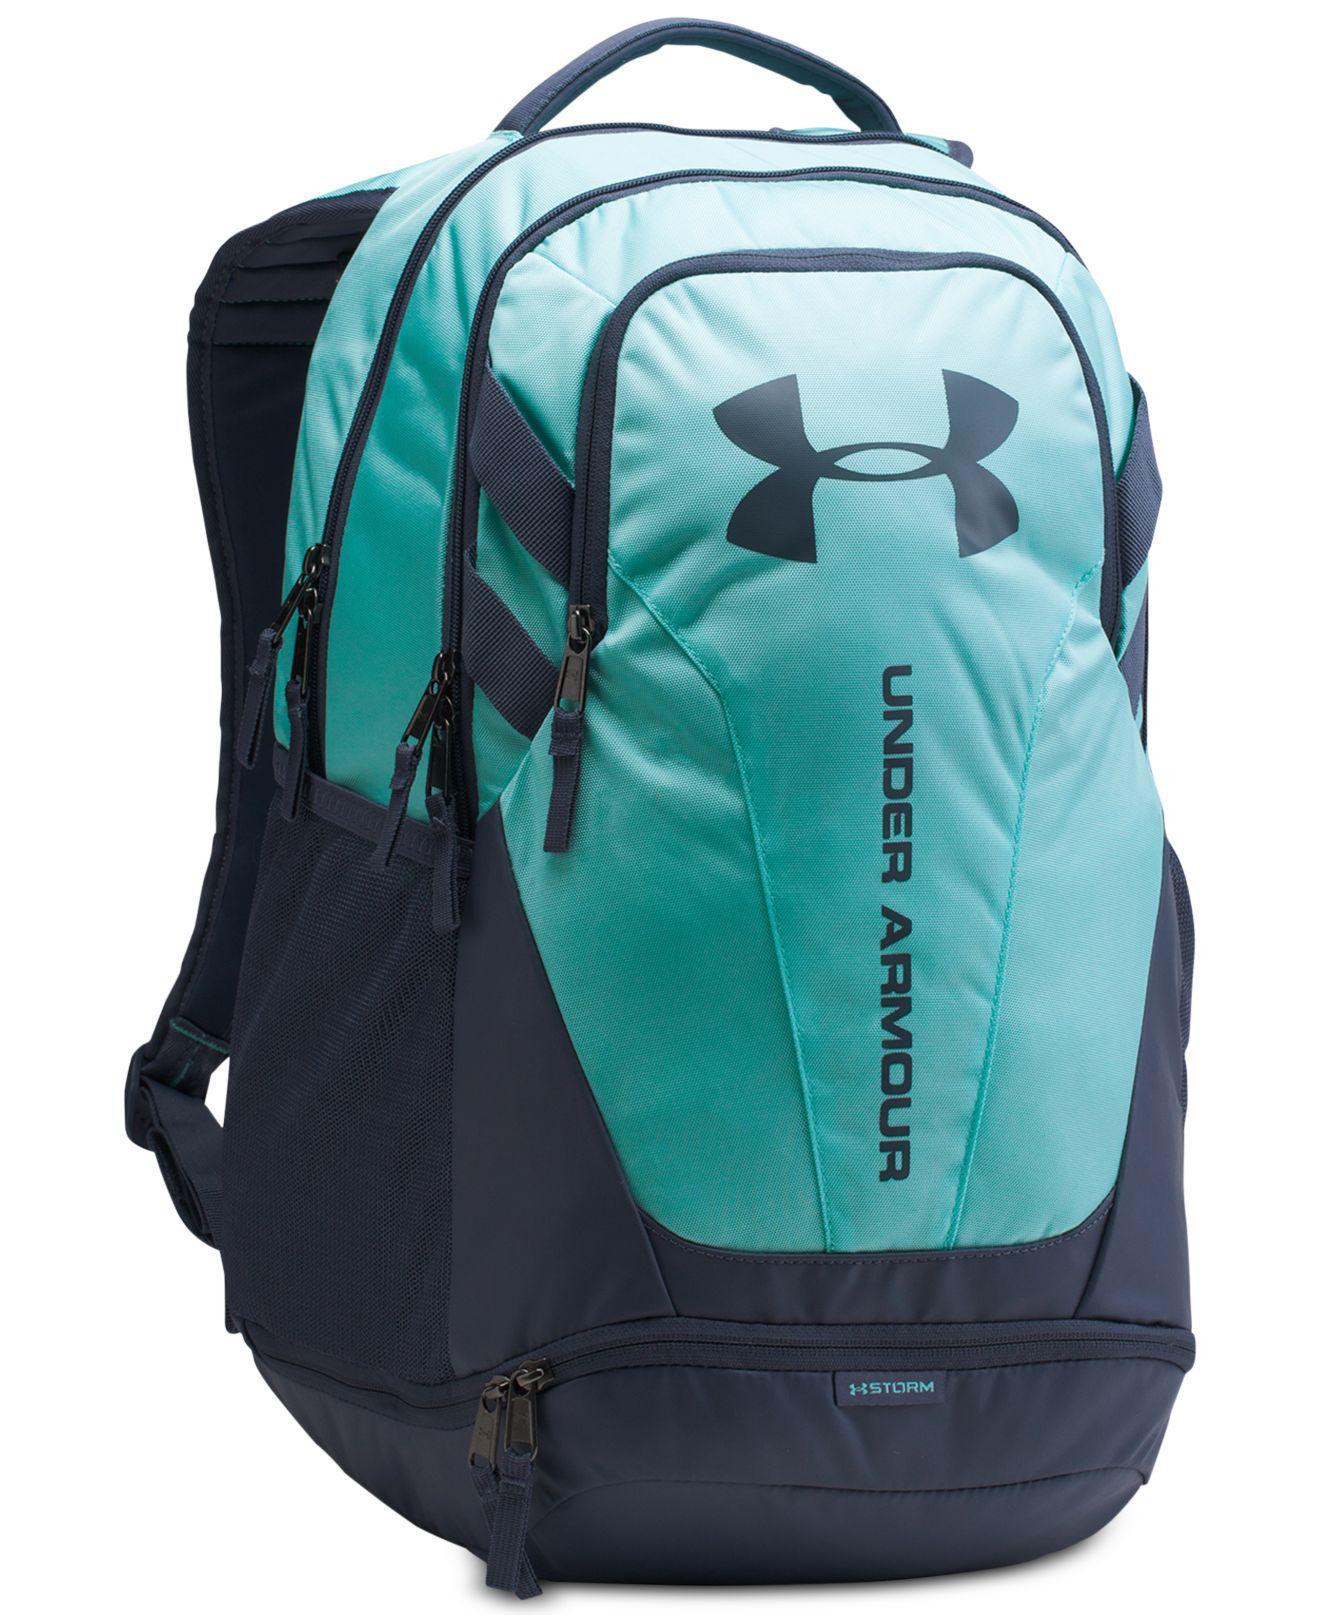 c3bde57656b Under Armour Hustle 3.0 Backpack in Blue for Men - Lyst